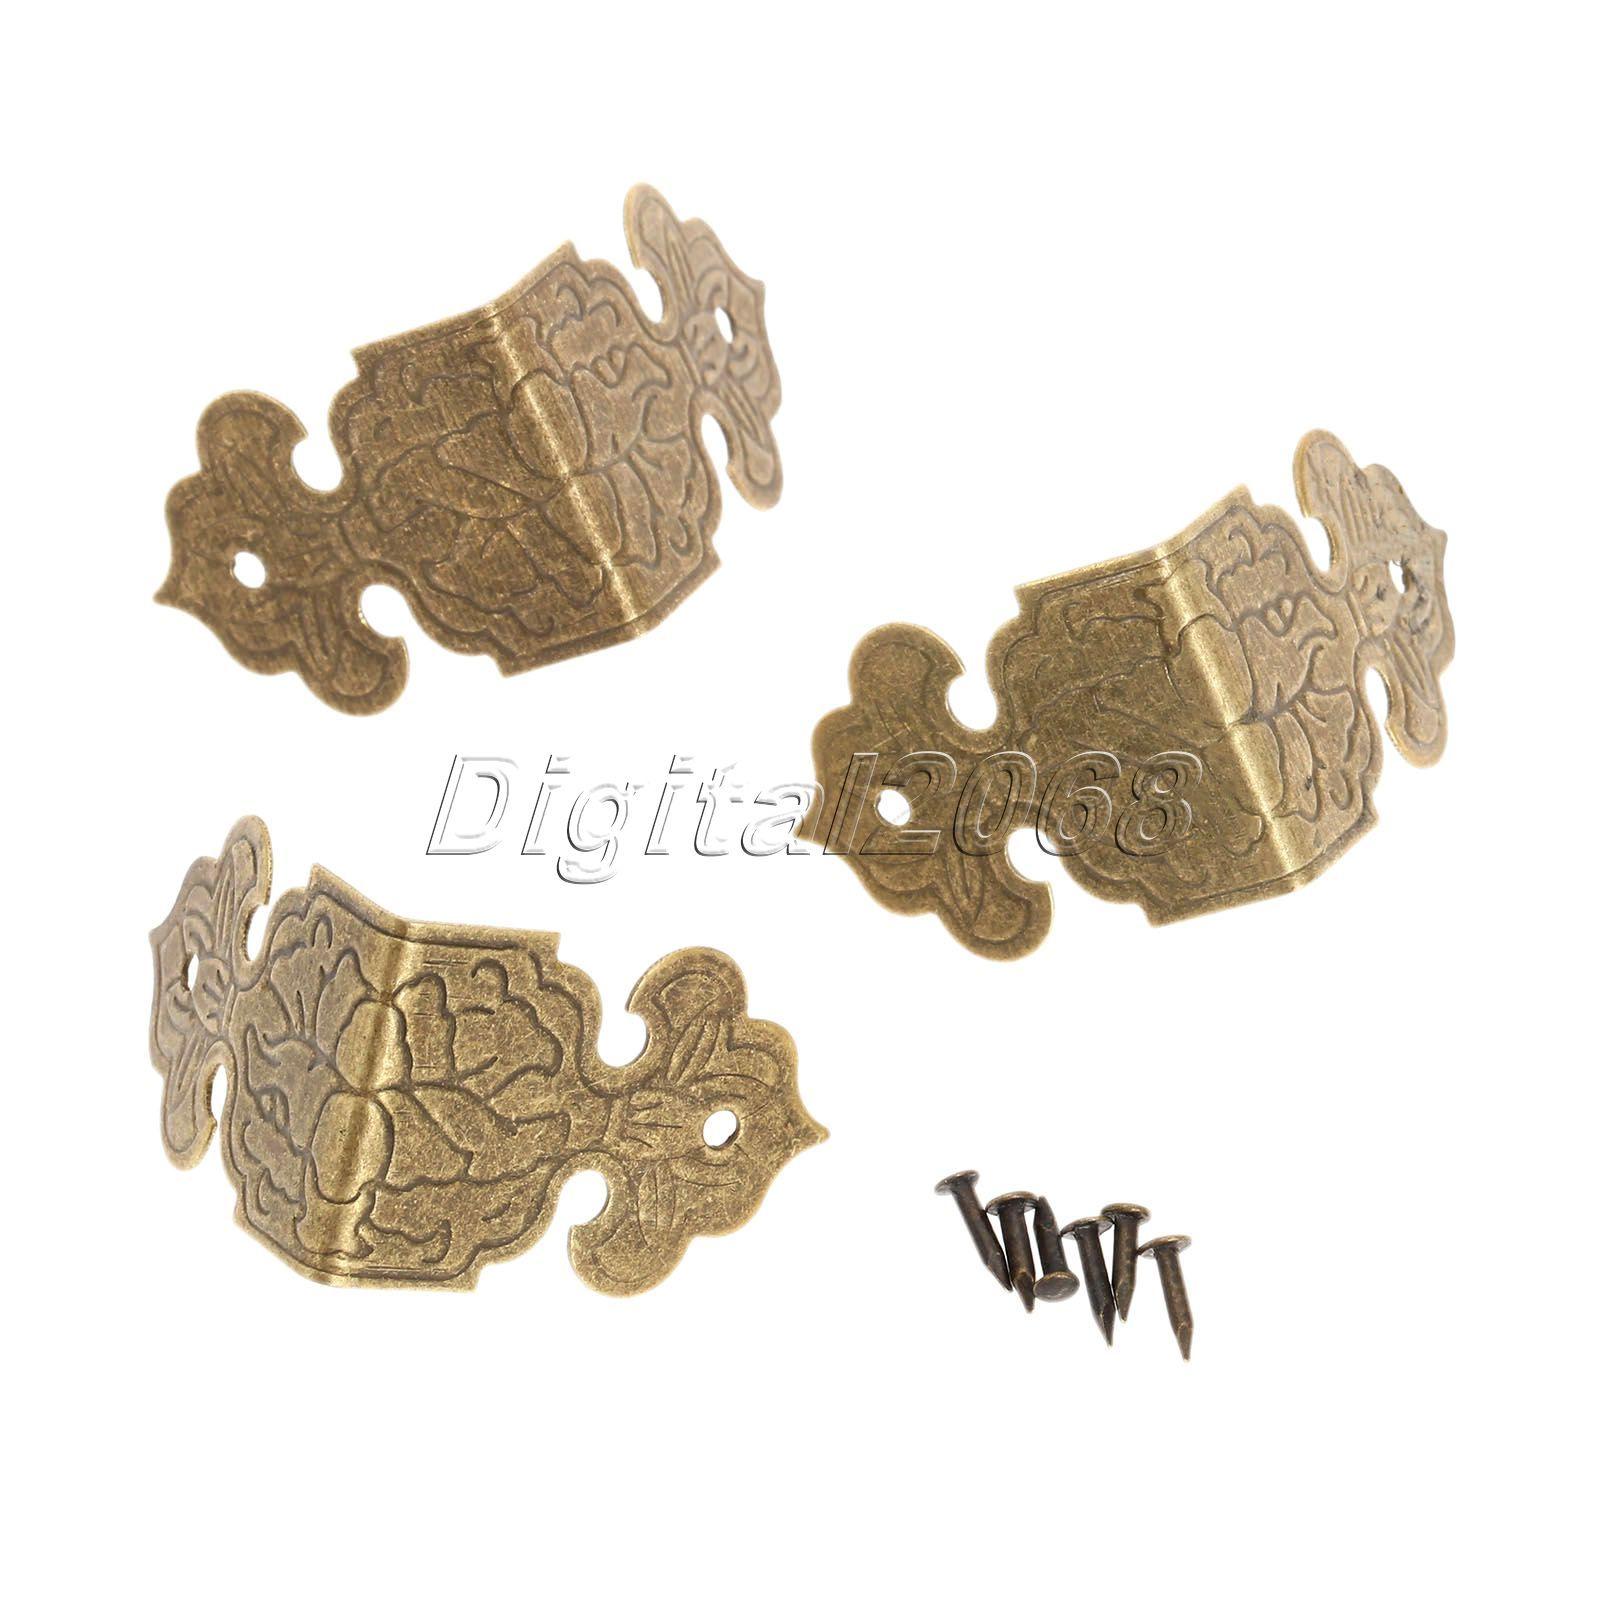 Hot Selling 12Pcs Iron Bronzegolden Decorative Jewelry Chest Wine Gift